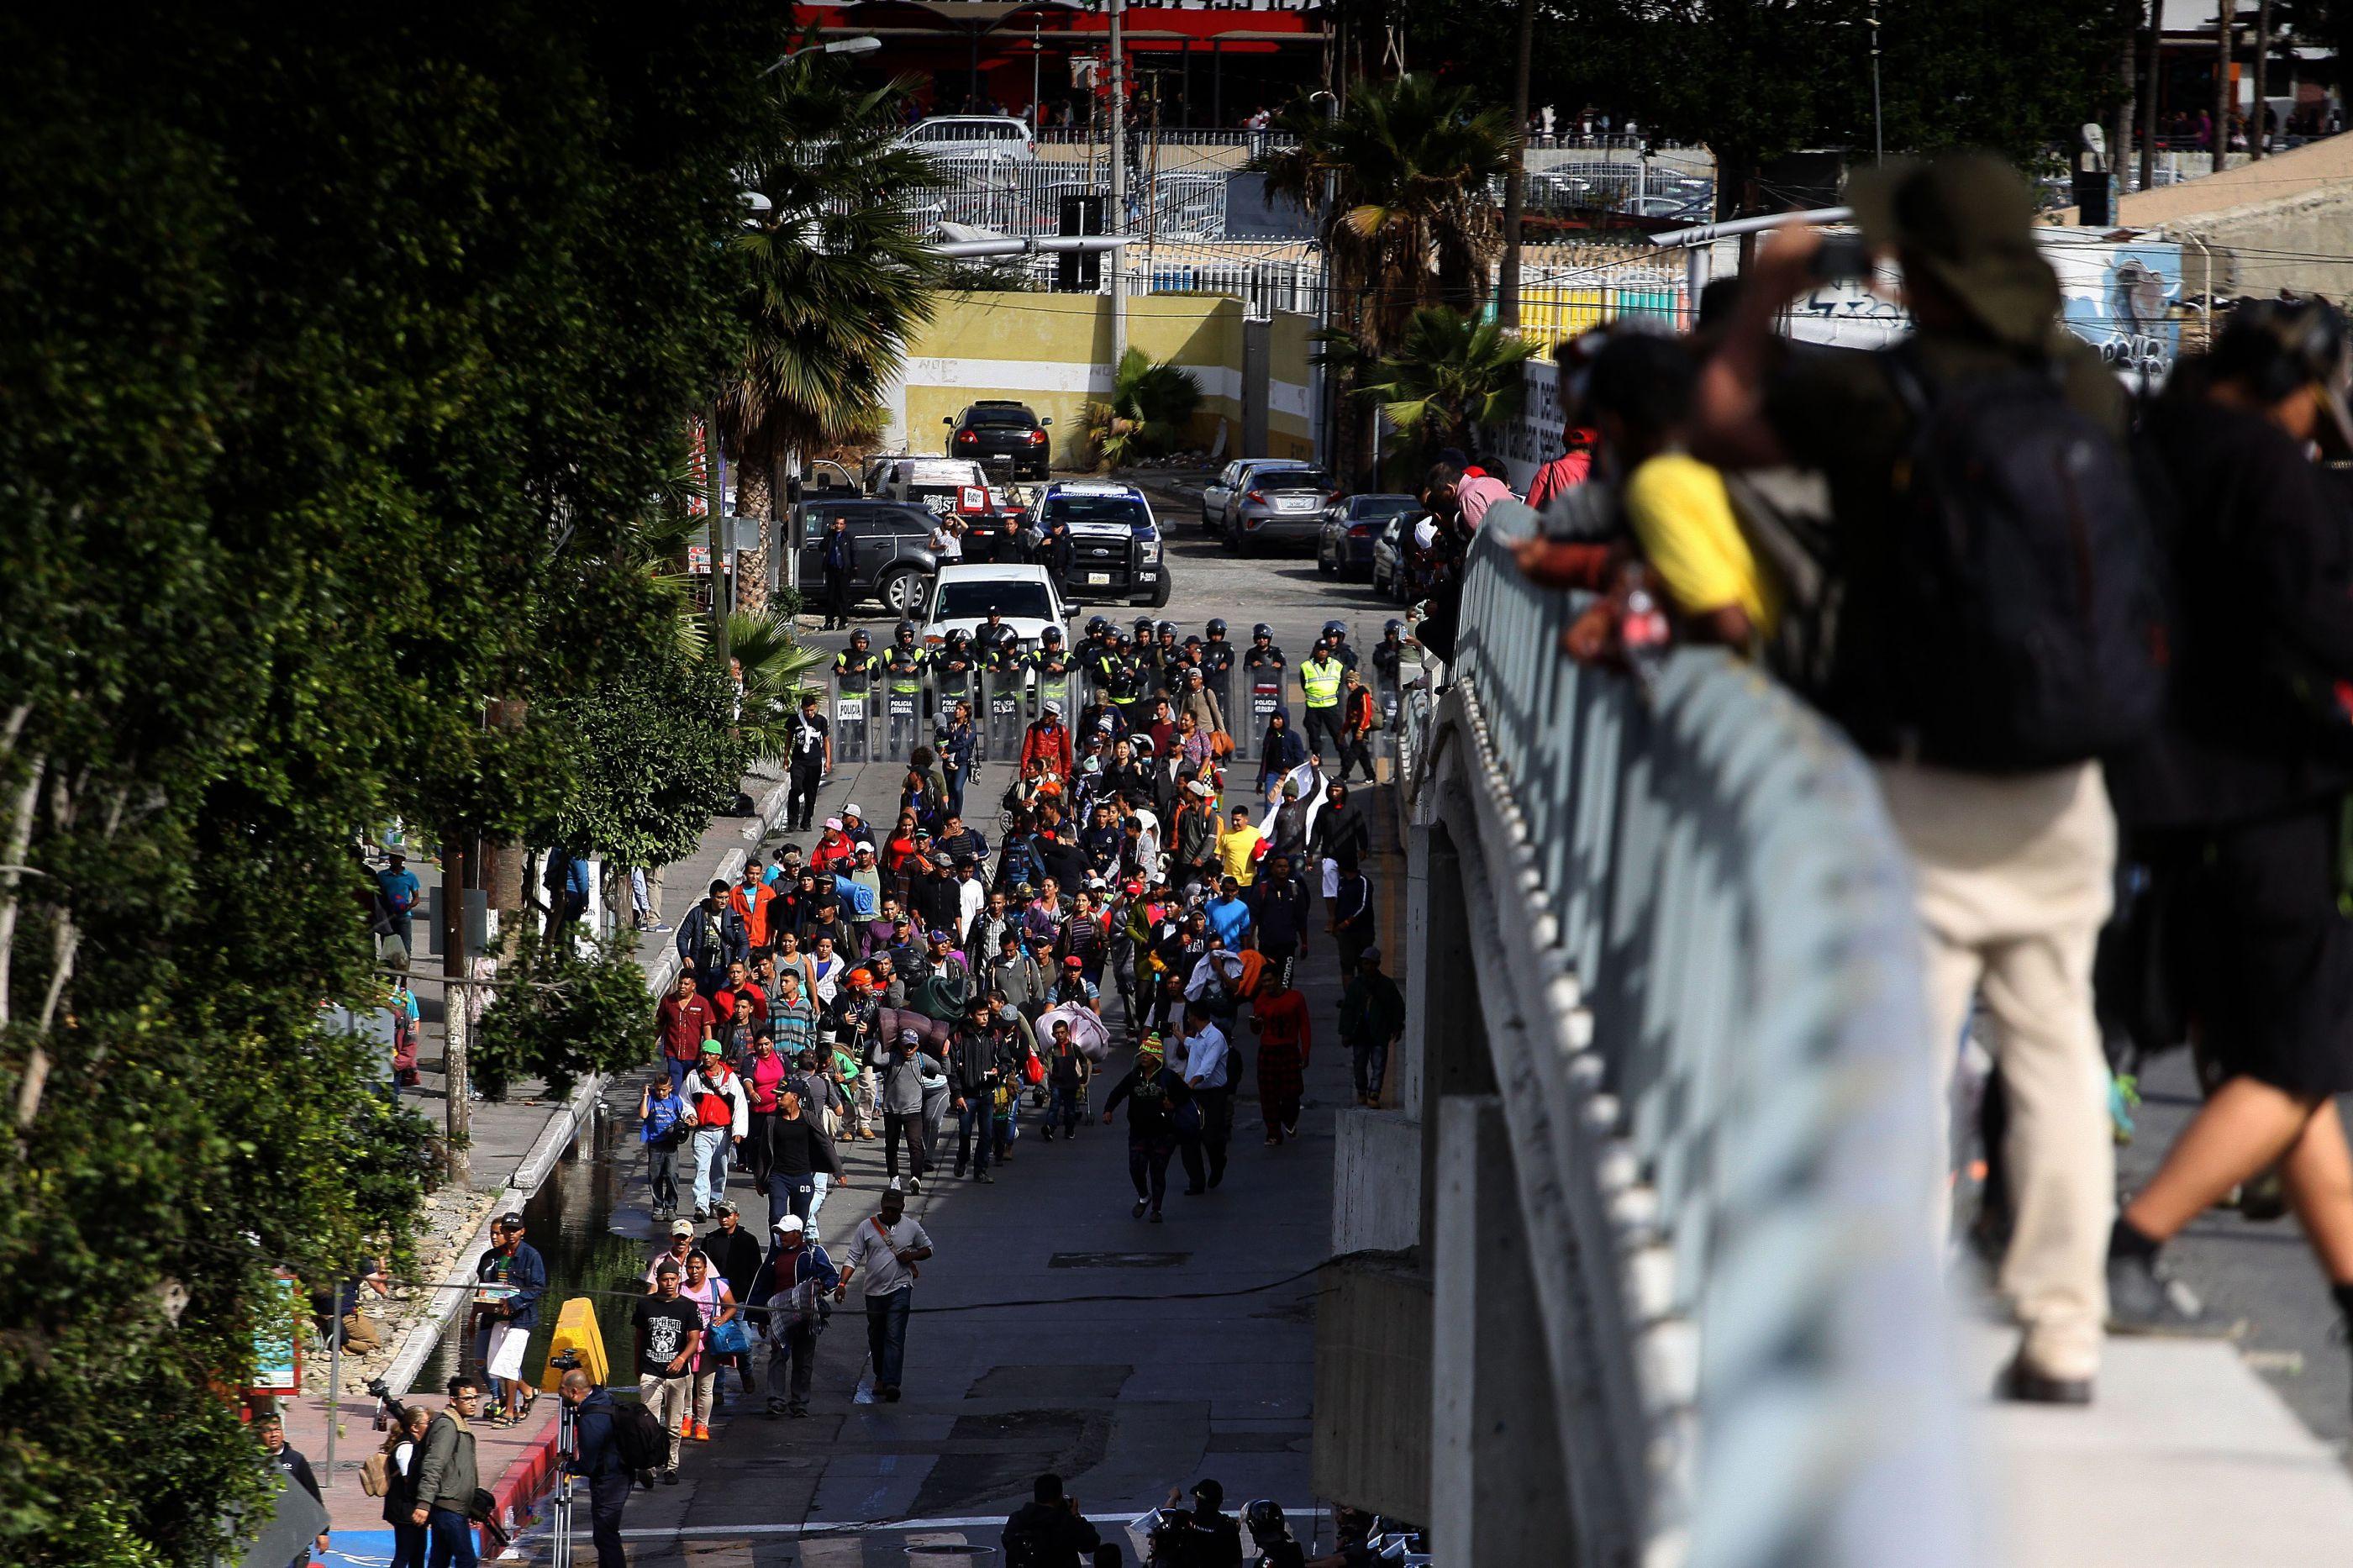 Trump confirma acordo com México sobre asilo de migrantes